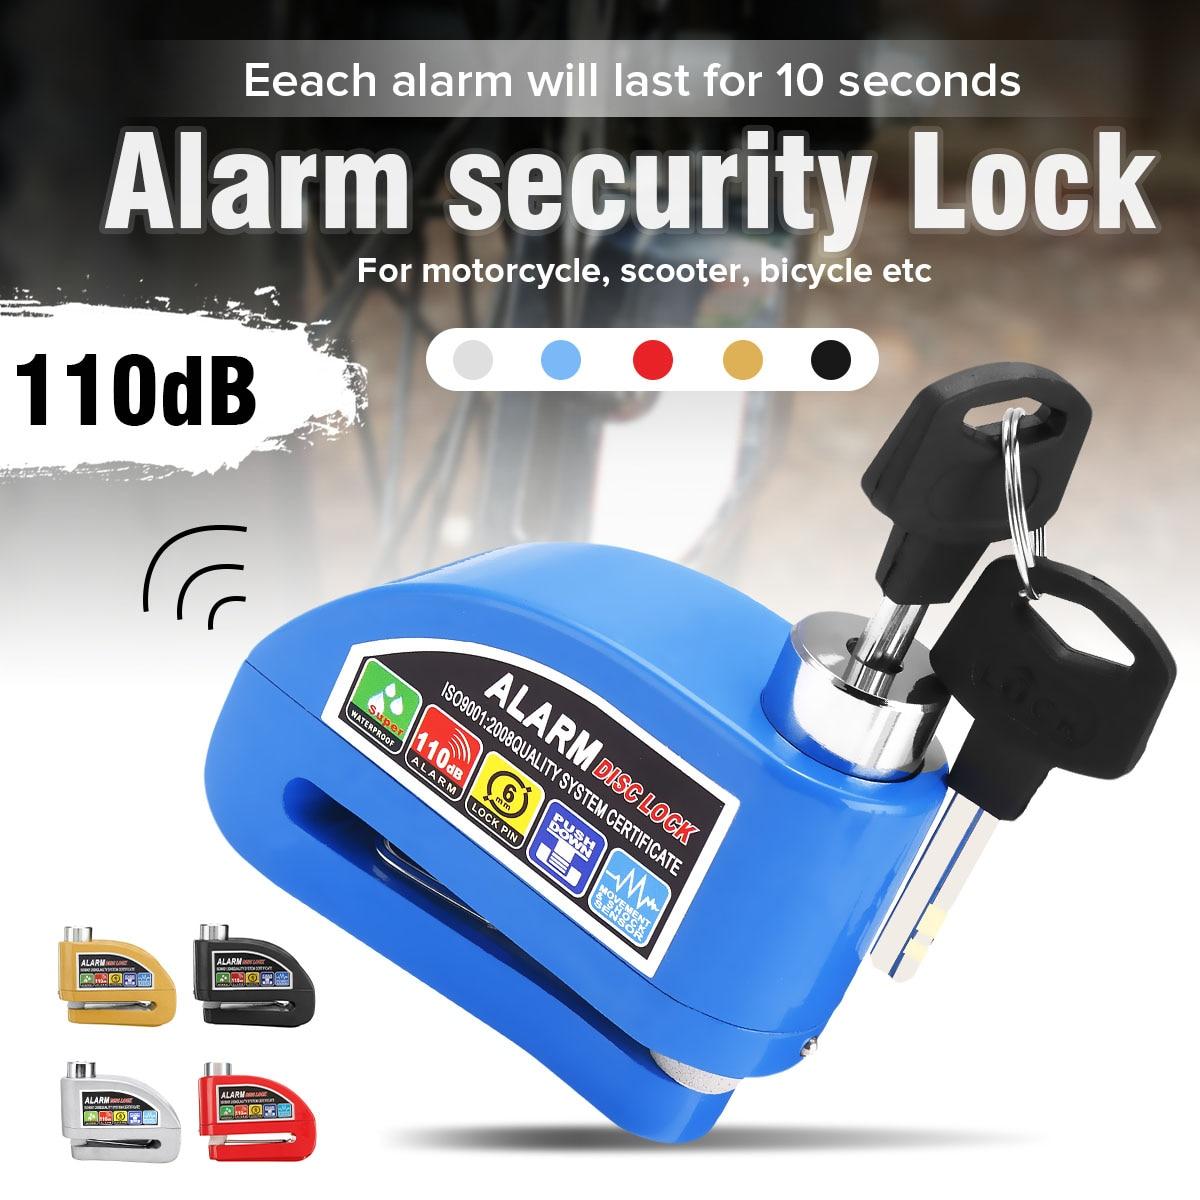 110dB Motorcycle Bike Scooter Security Anti-theft Wheel Disc Brake Lock Alarm Kit Waterproof +Reminder Cable + Alarm Lock Bag